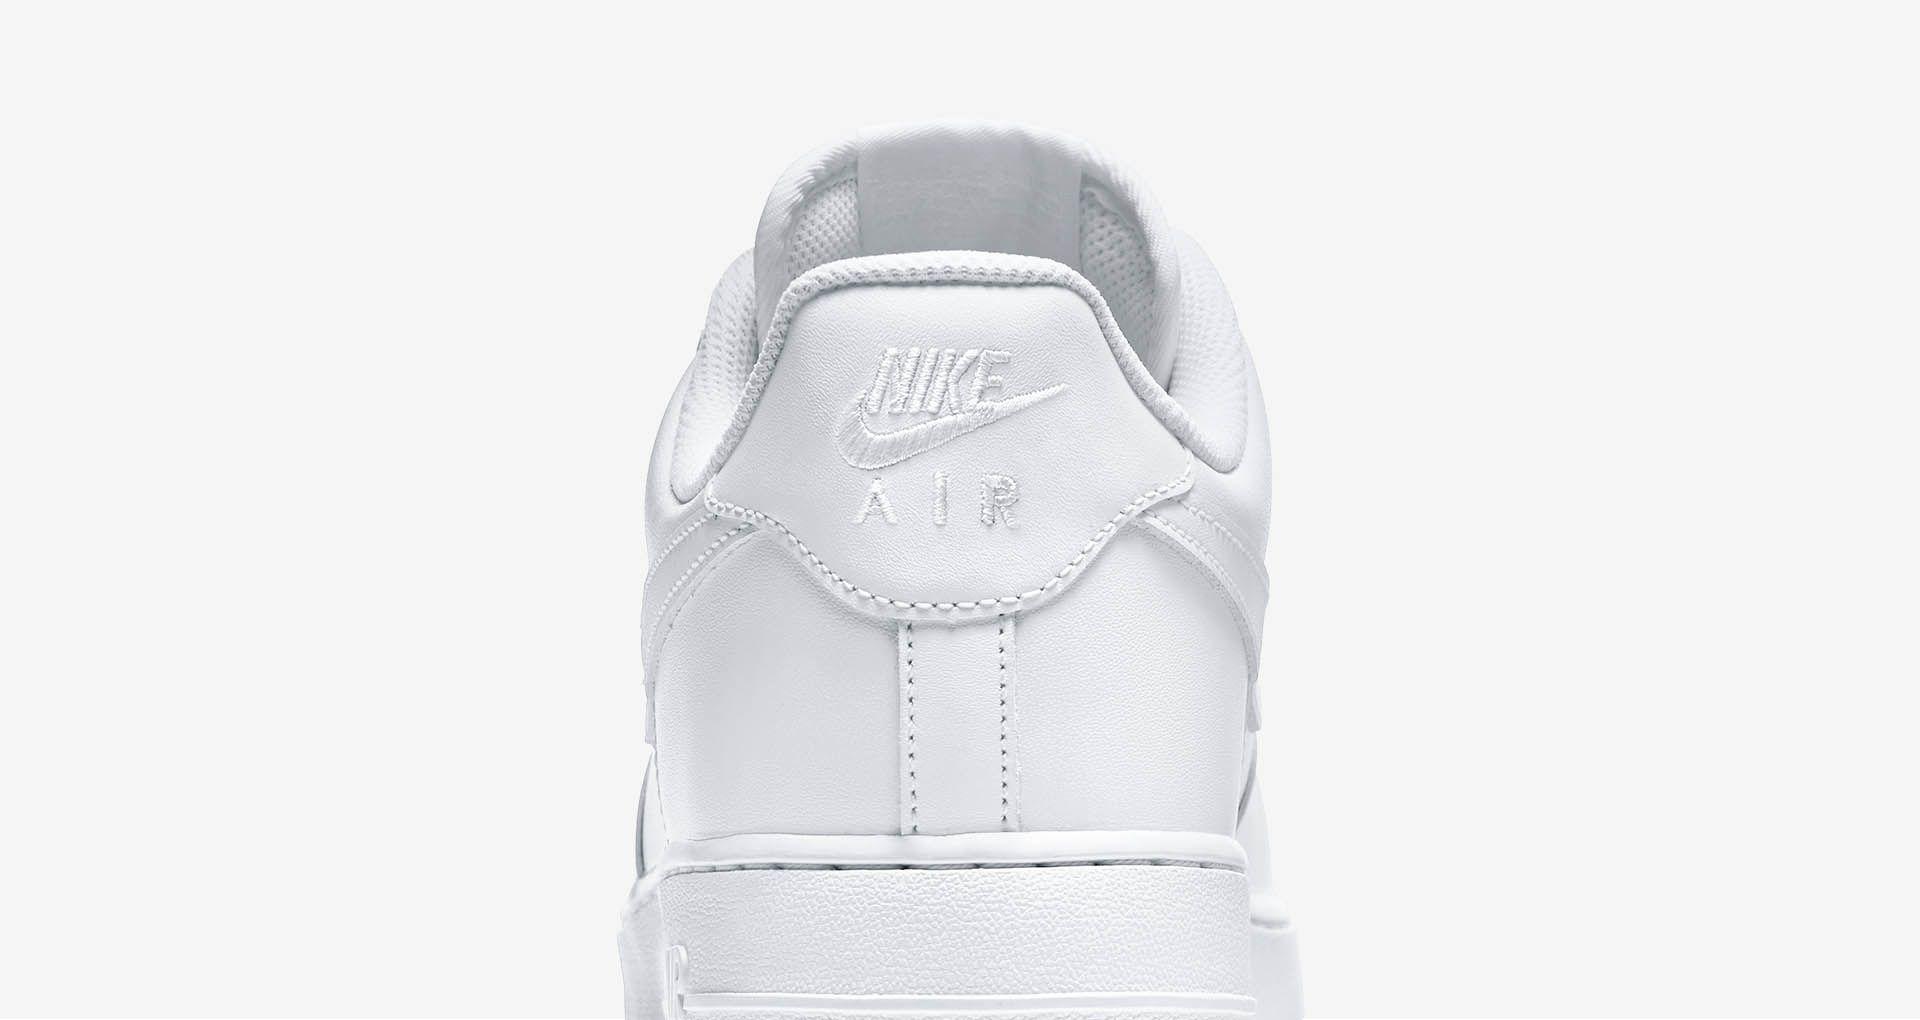 Nike Air Force 1 Low 'Triple White'. Nike SNKRS